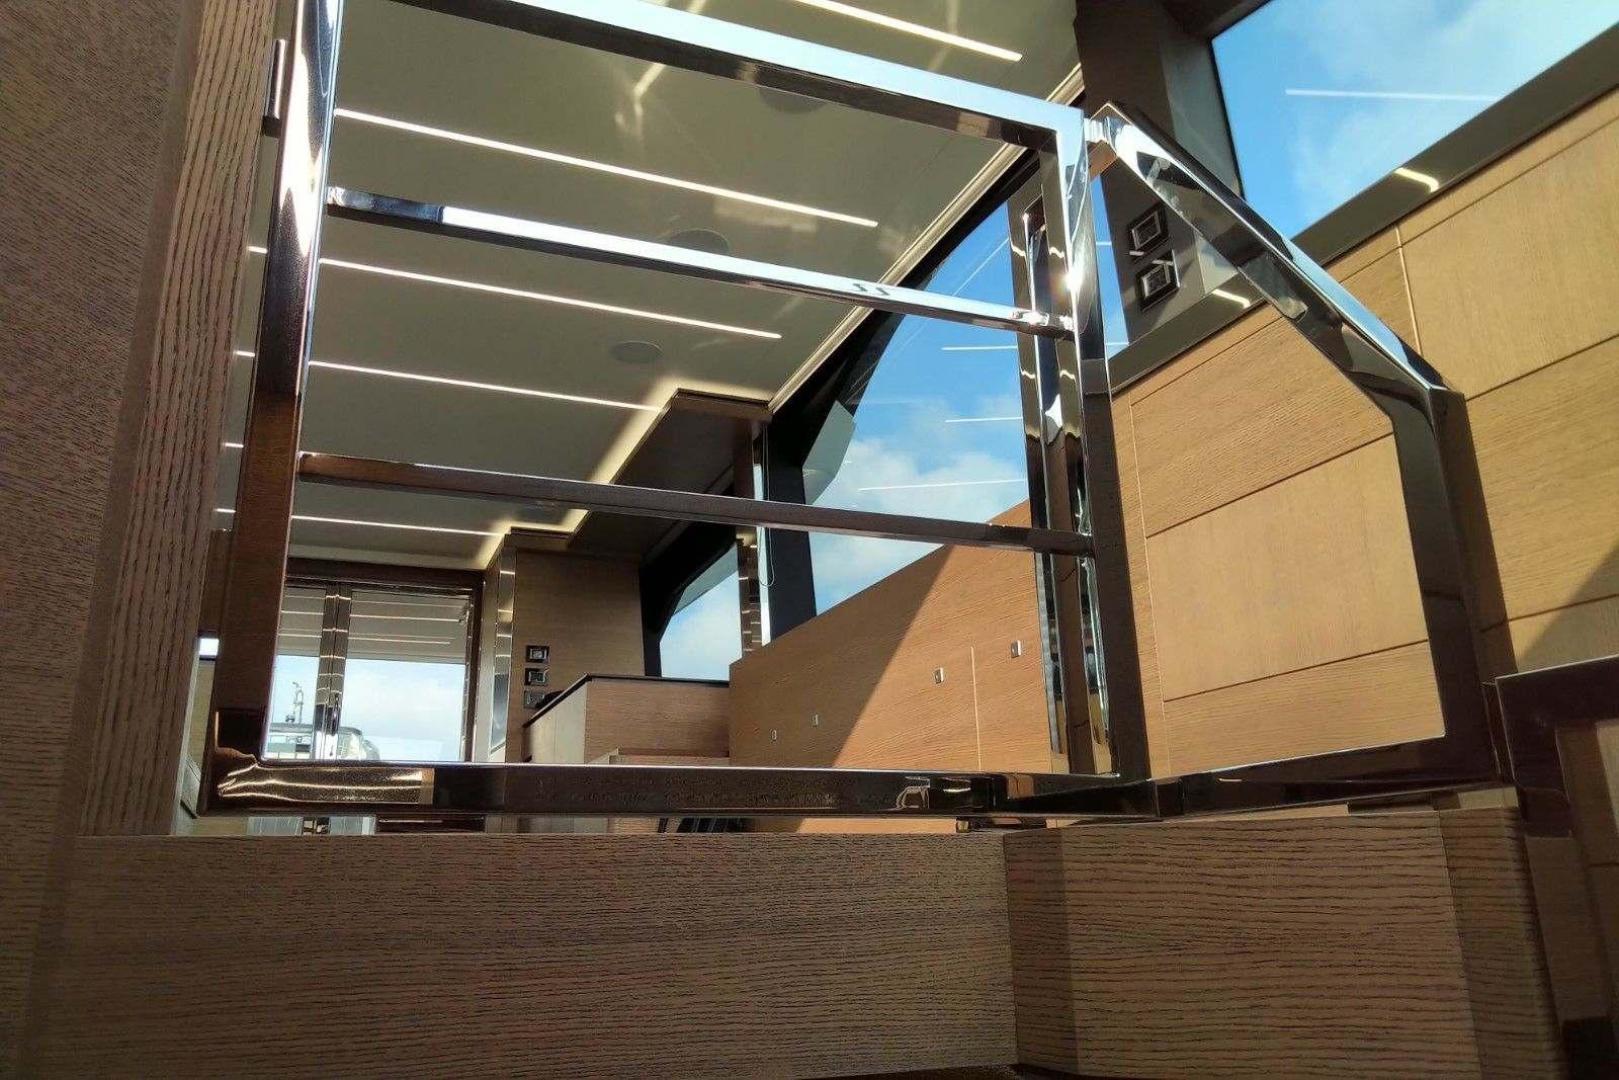 Astondoa-66 Flybridge 2020-Serenity New Rochelle-New York-United States-1489330 | Thumbnail